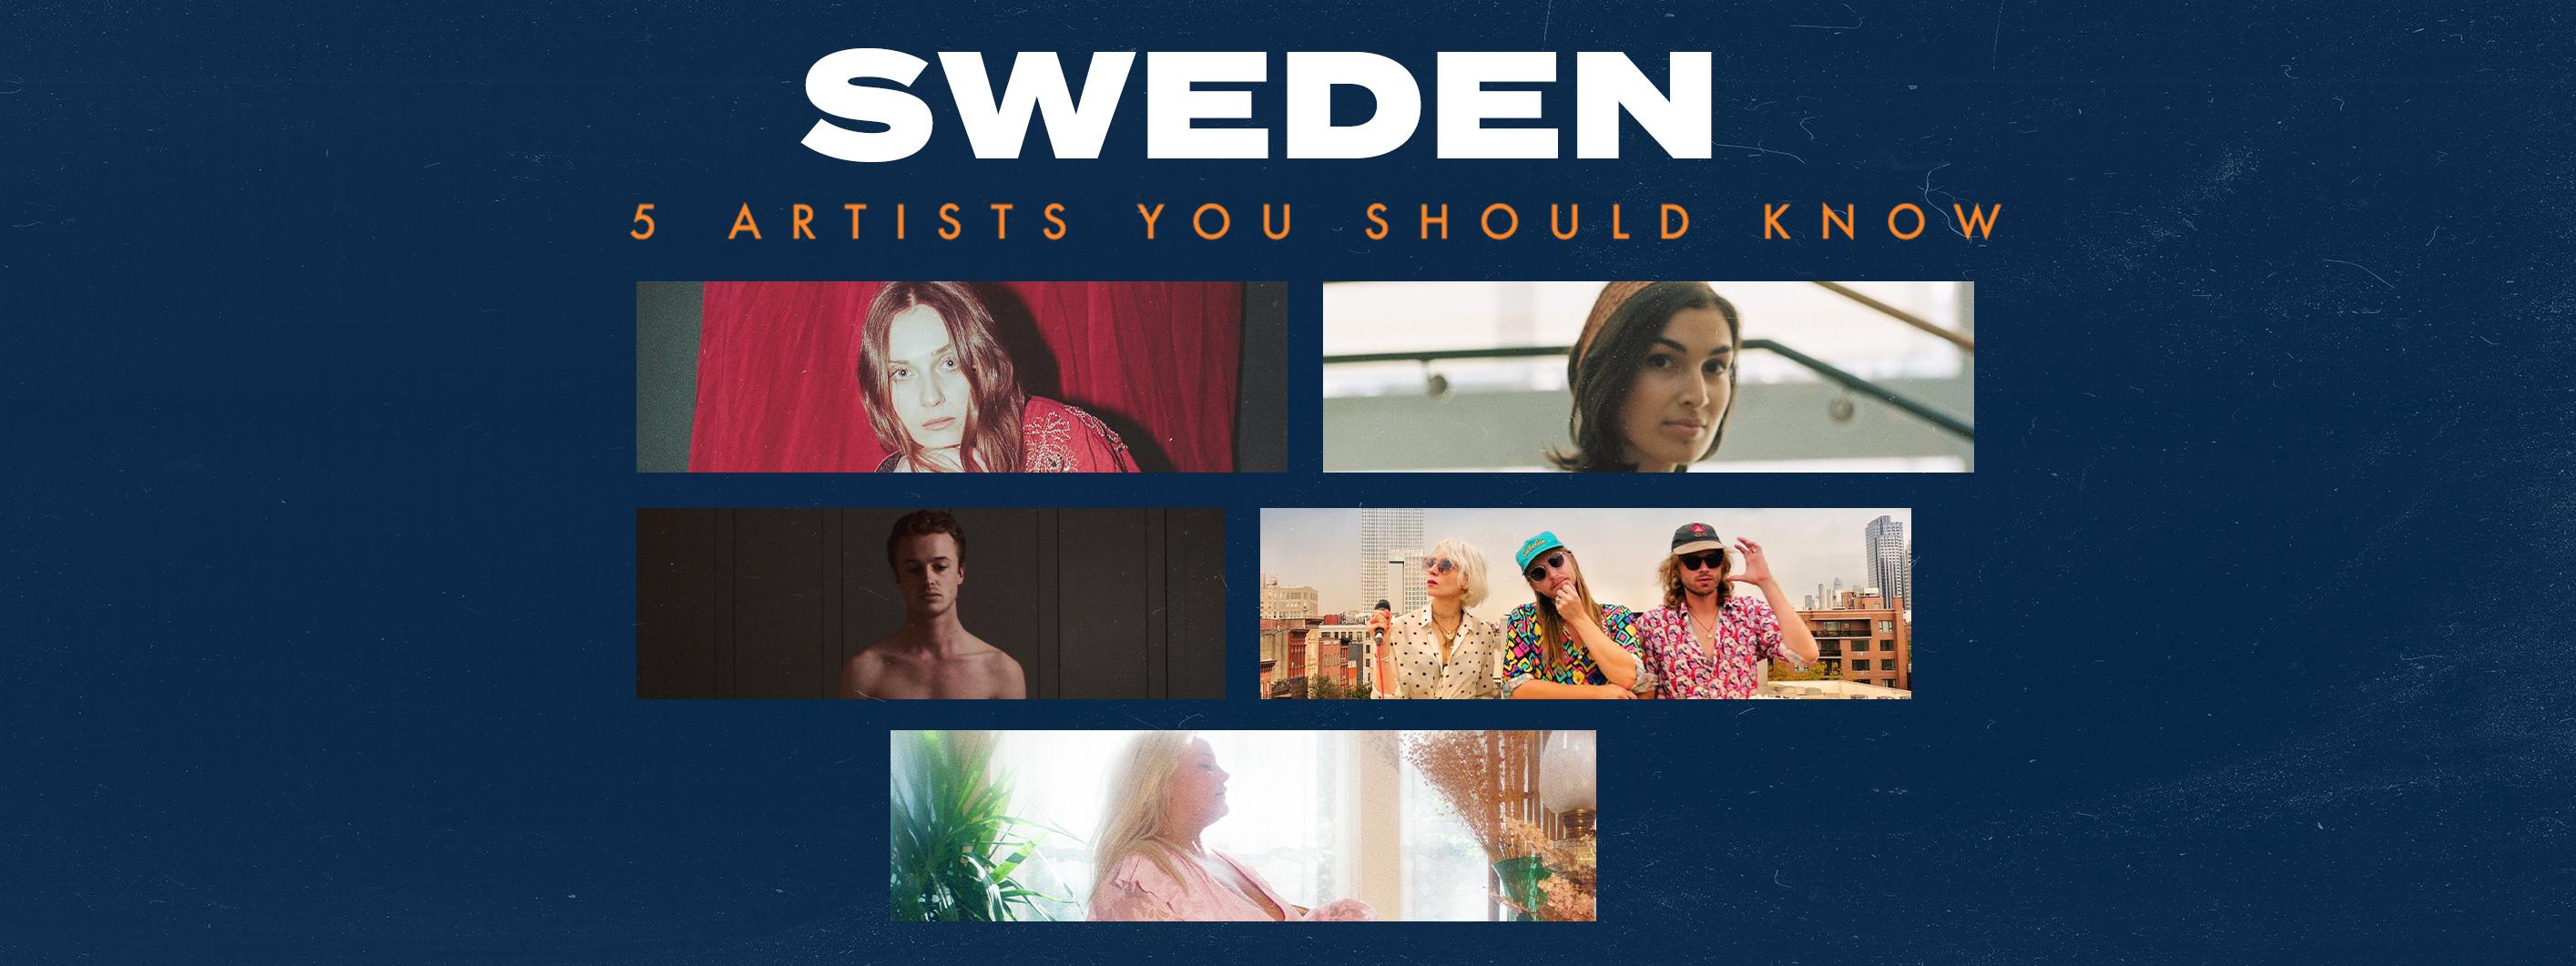 5 Artists You Should Know: Sweden